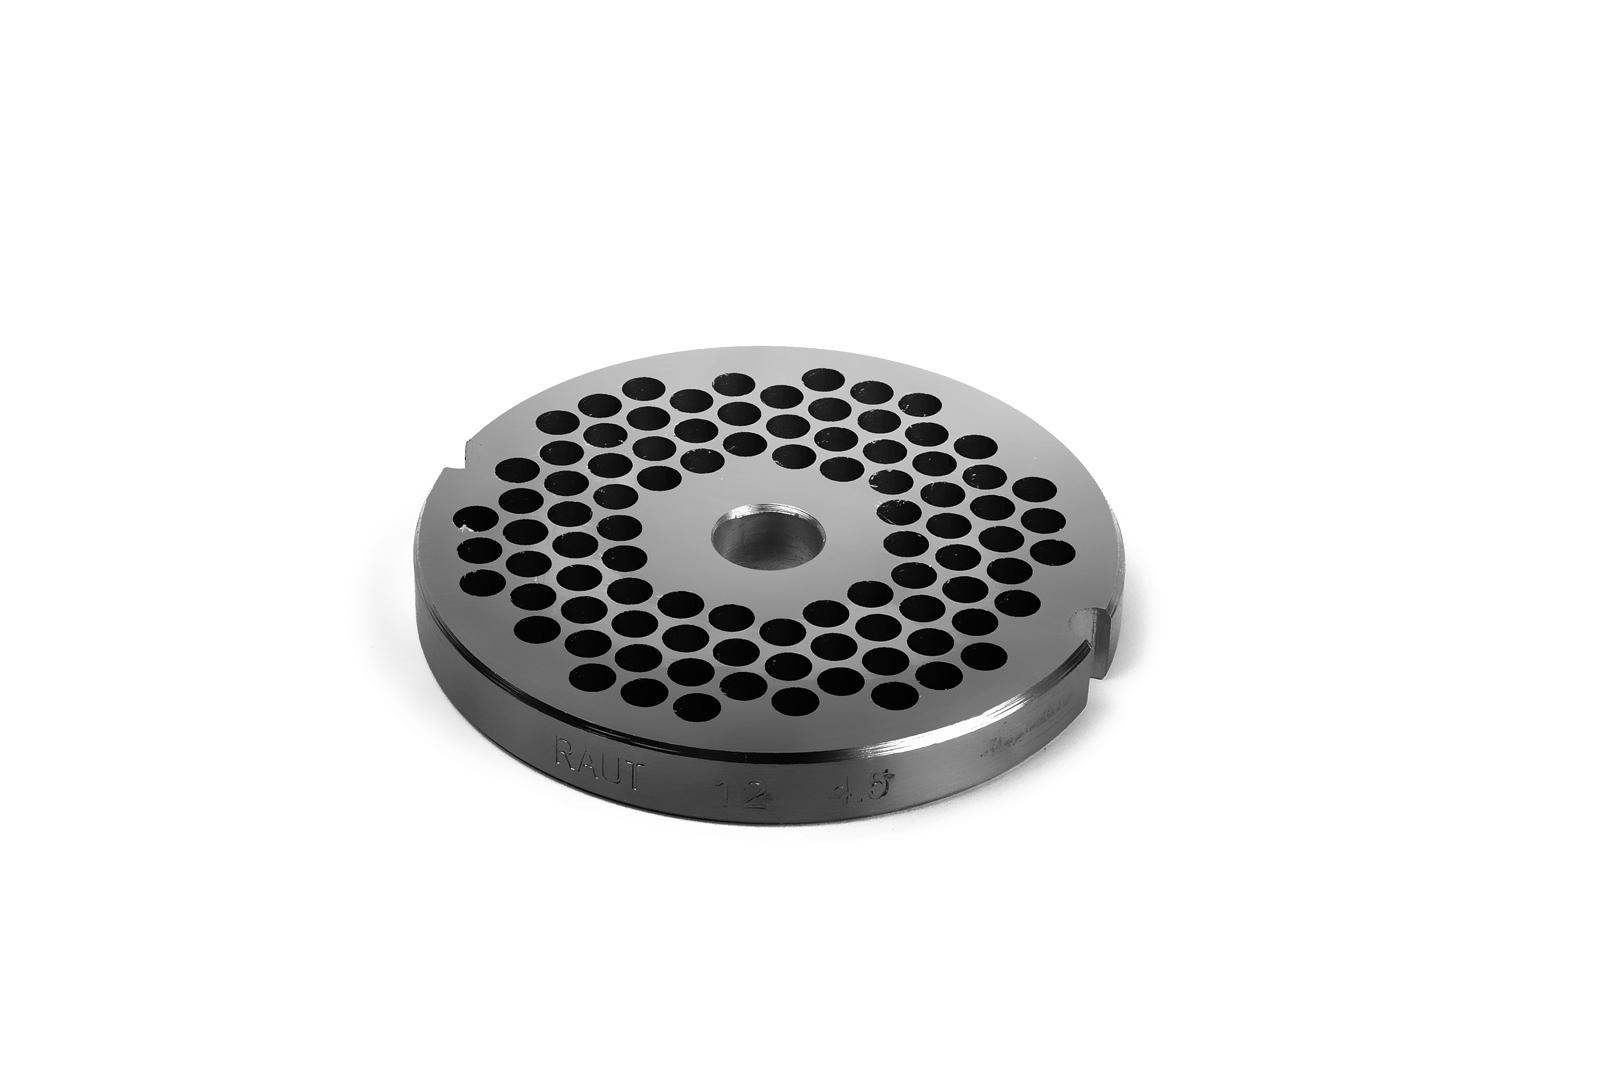 Piastra per Tritacarne 12 - Fori da 4,5 mm - Tre Spade